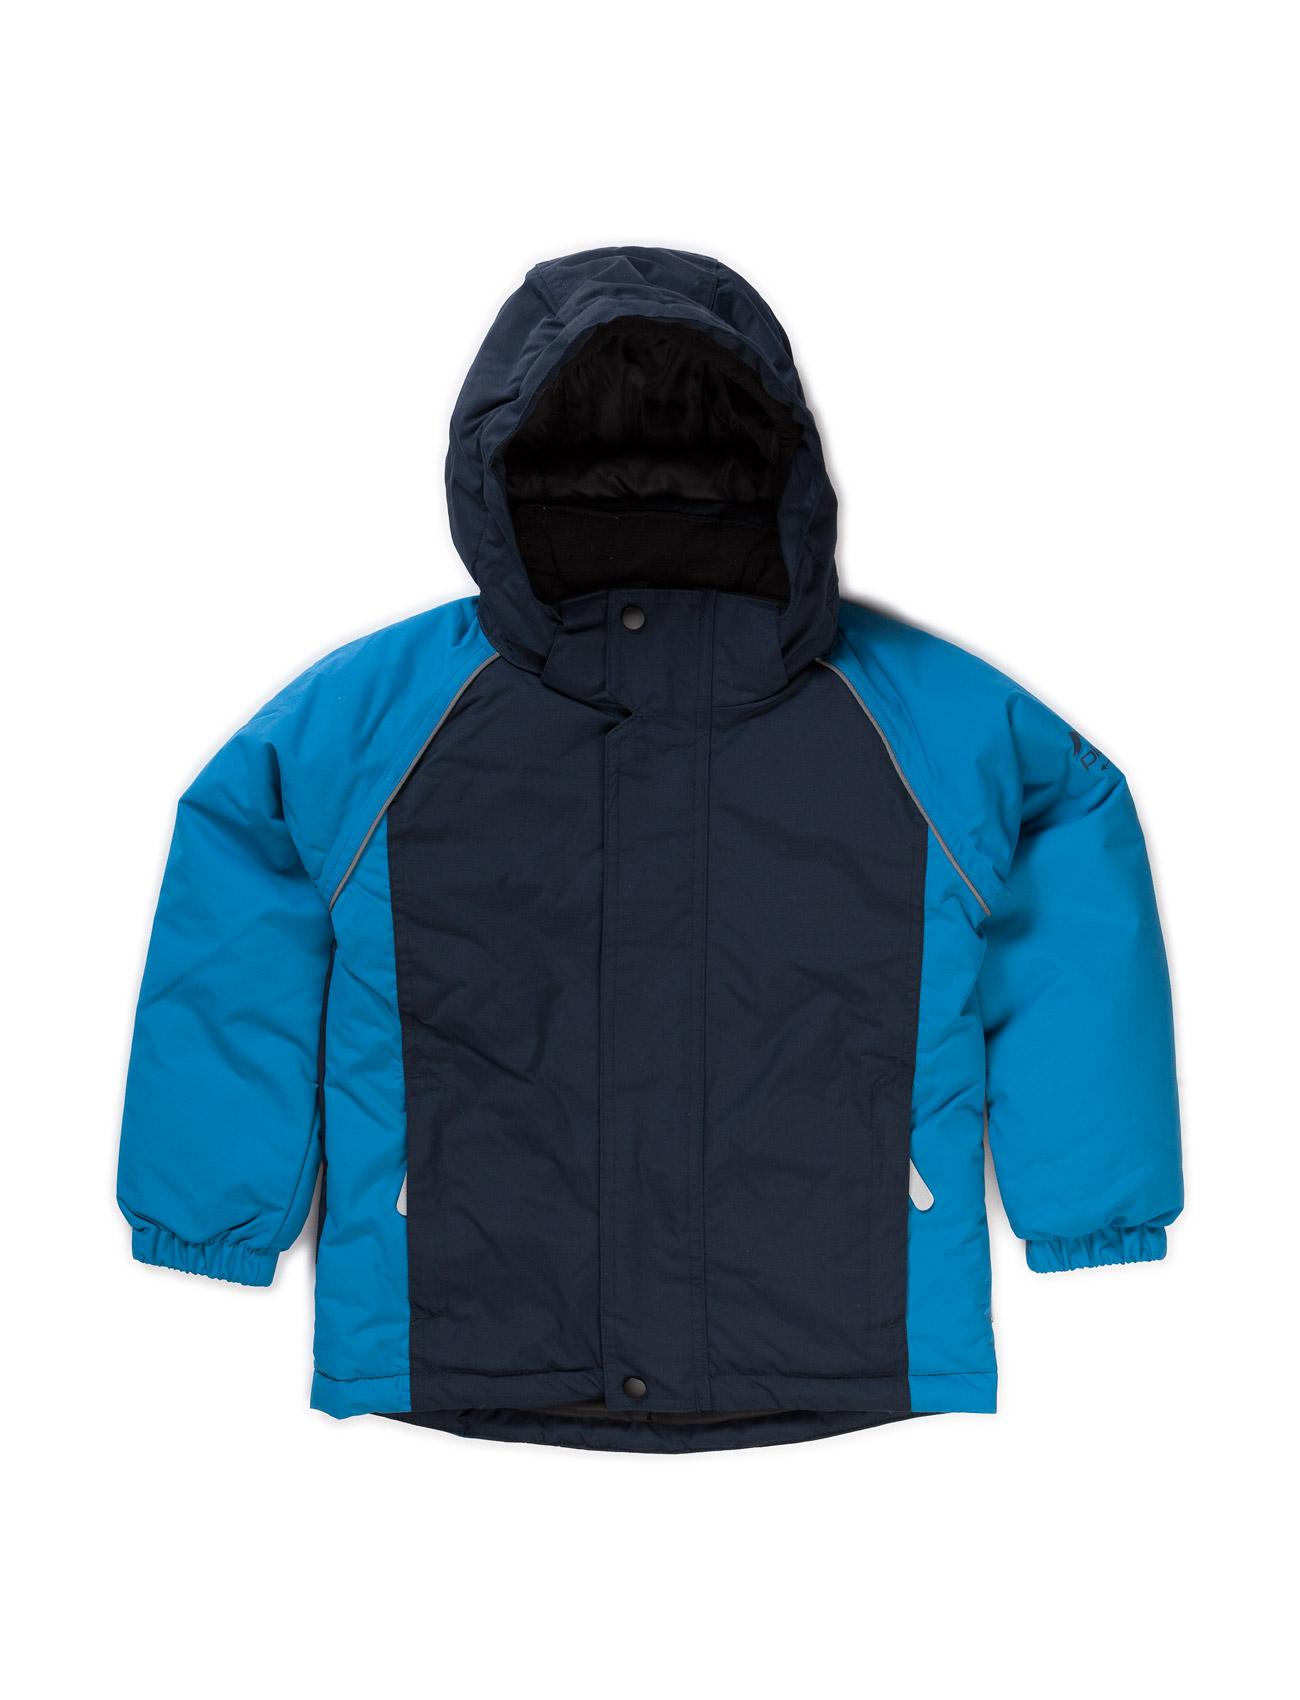 Wind Kids Jacket Dress Blues Fo 315 name it Jakker & Frakker til Børn i Dress Blues